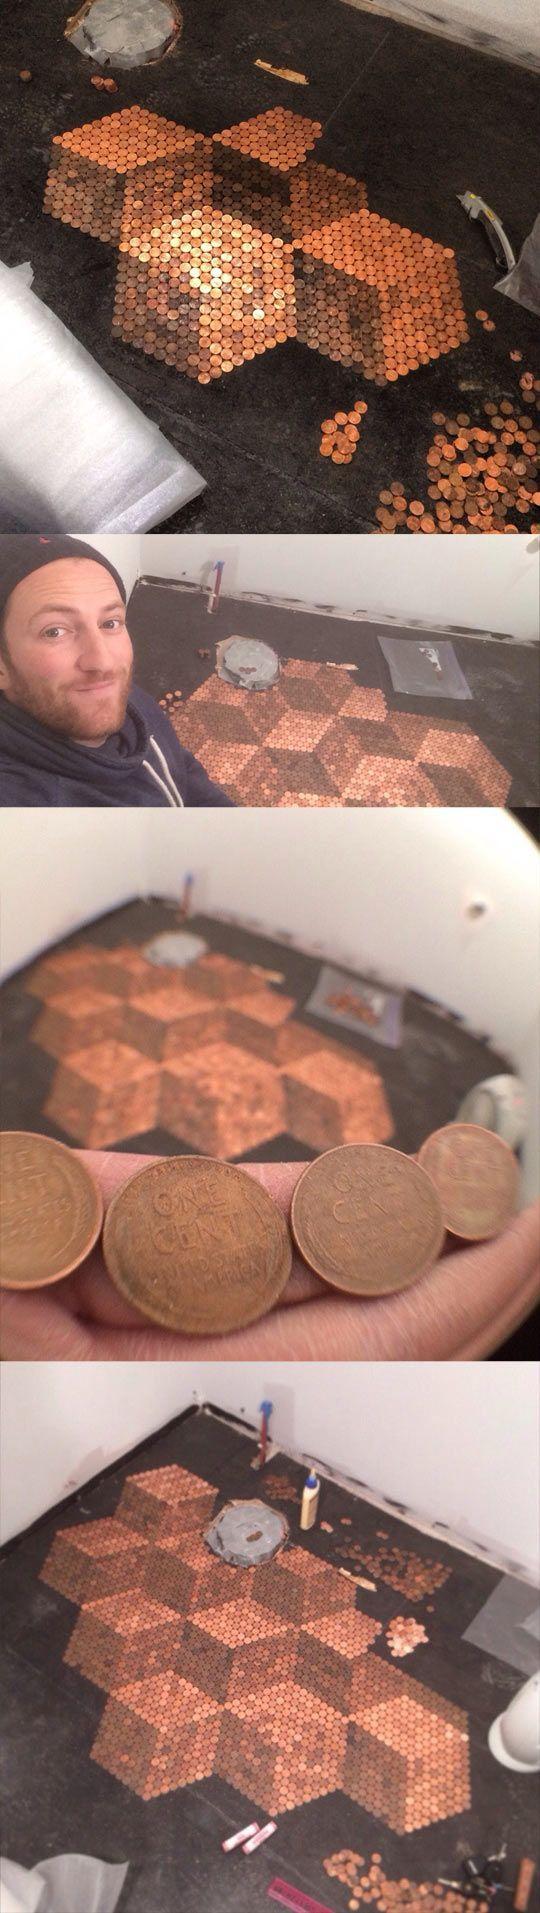 coins pennies floor bathroom. very cool with pattern. bodekunst mit pennies. pfennige. cent fussboden. super cooles muster.